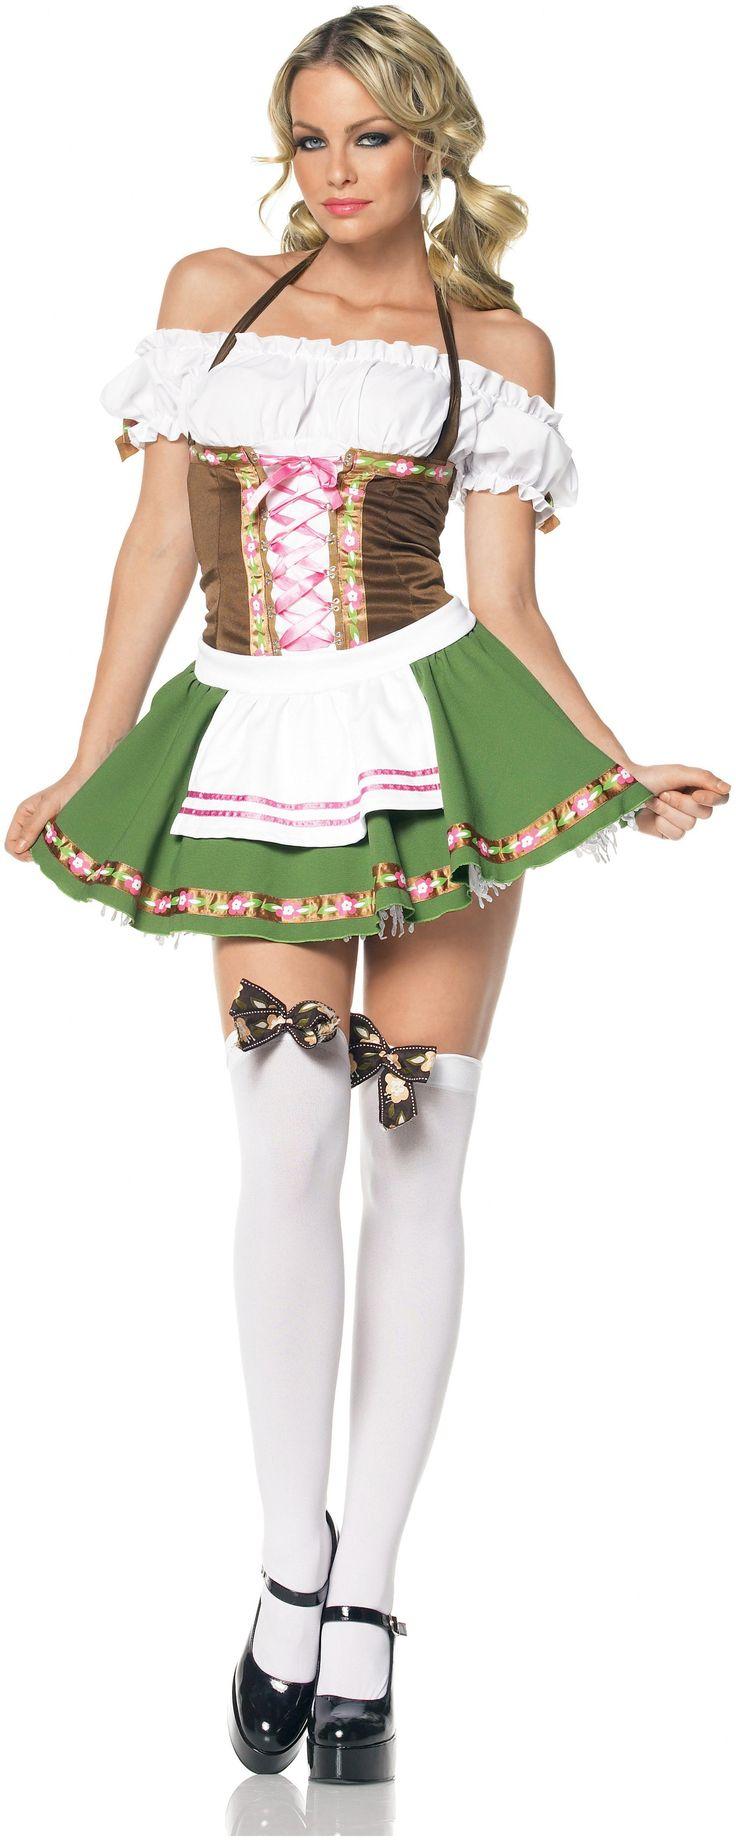 баварские официантки эро них девушки